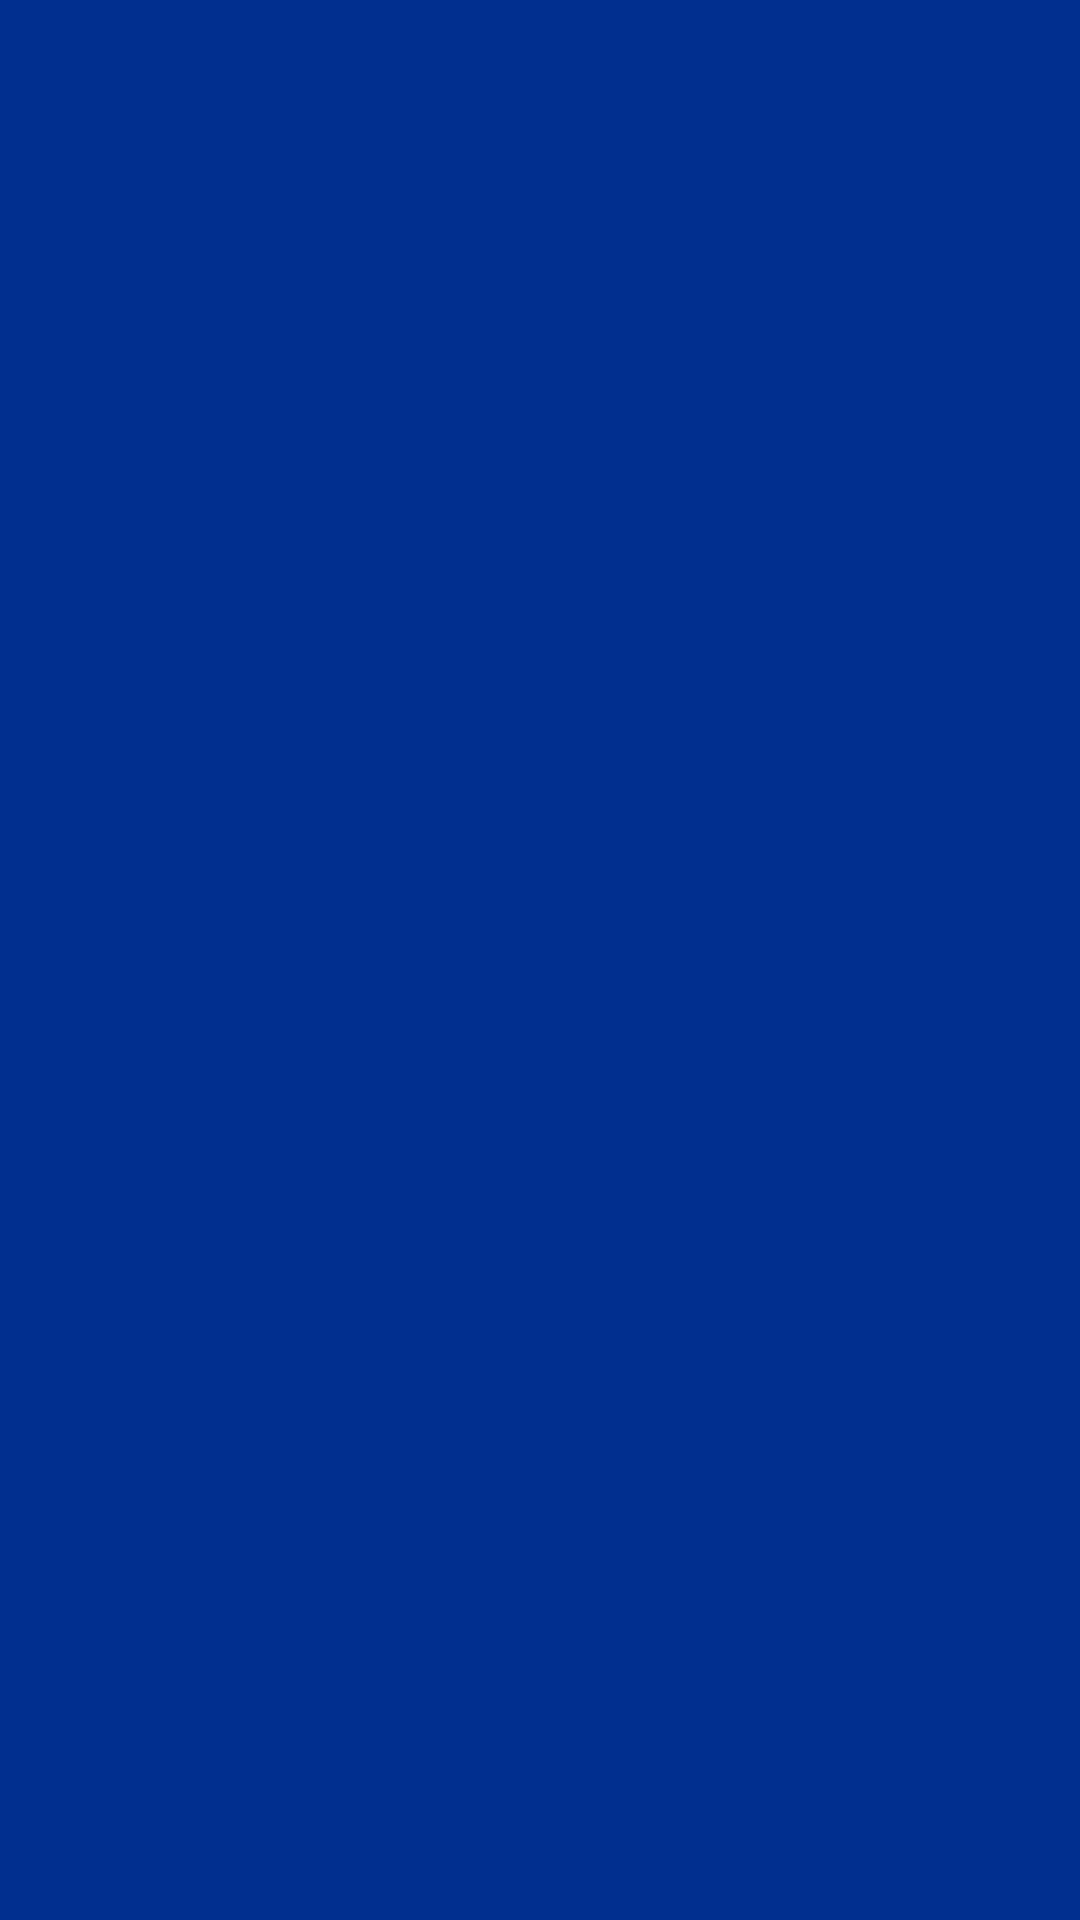 Plain Blue Wallpapers Top Free Plain Blue Backgrounds Wallpaperaccess